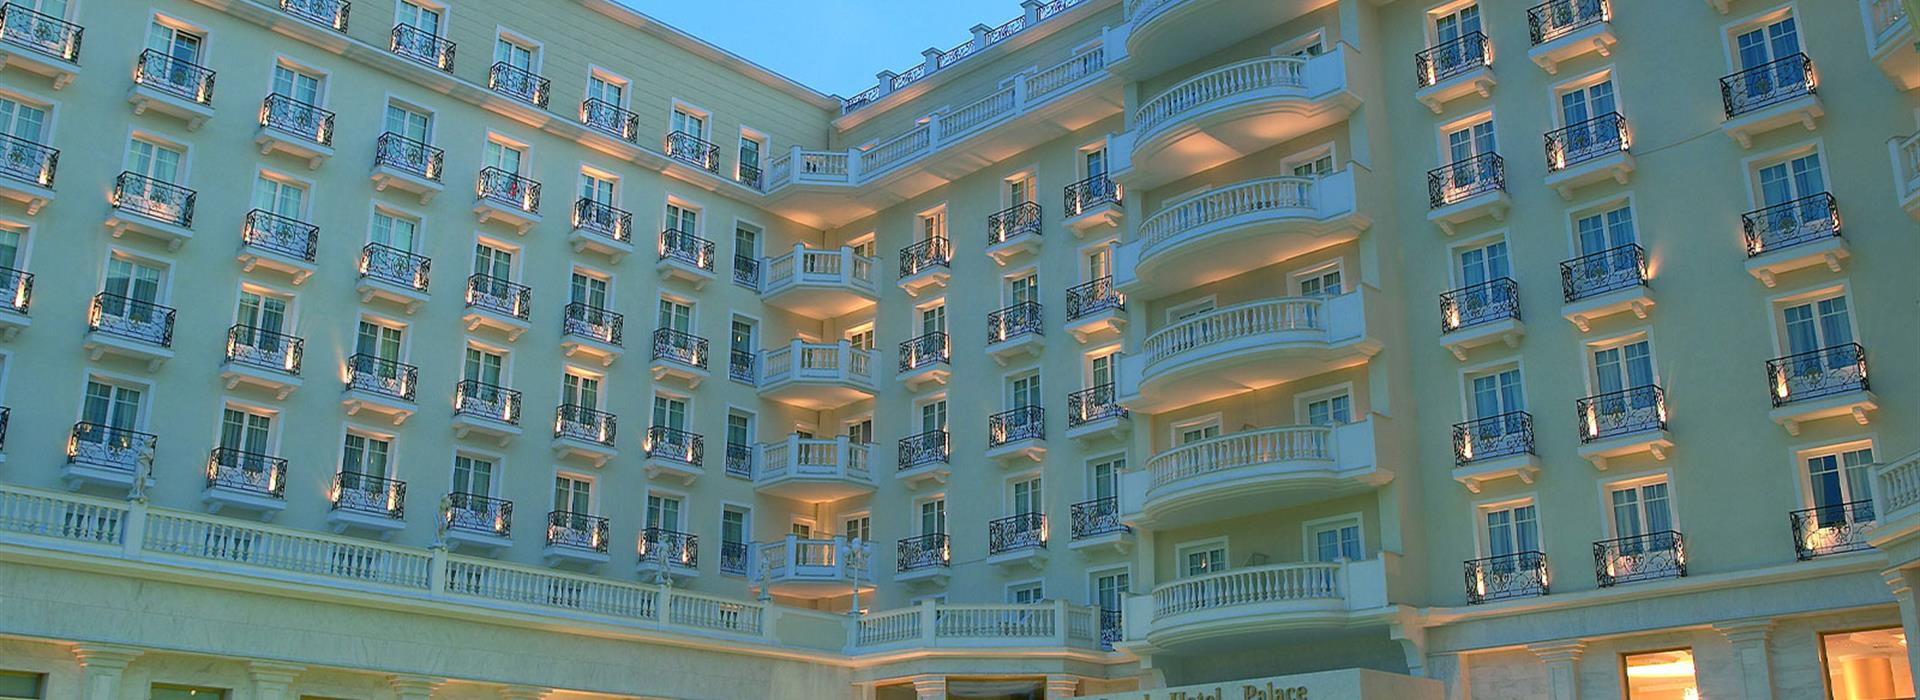 Grabd Hotel Palace